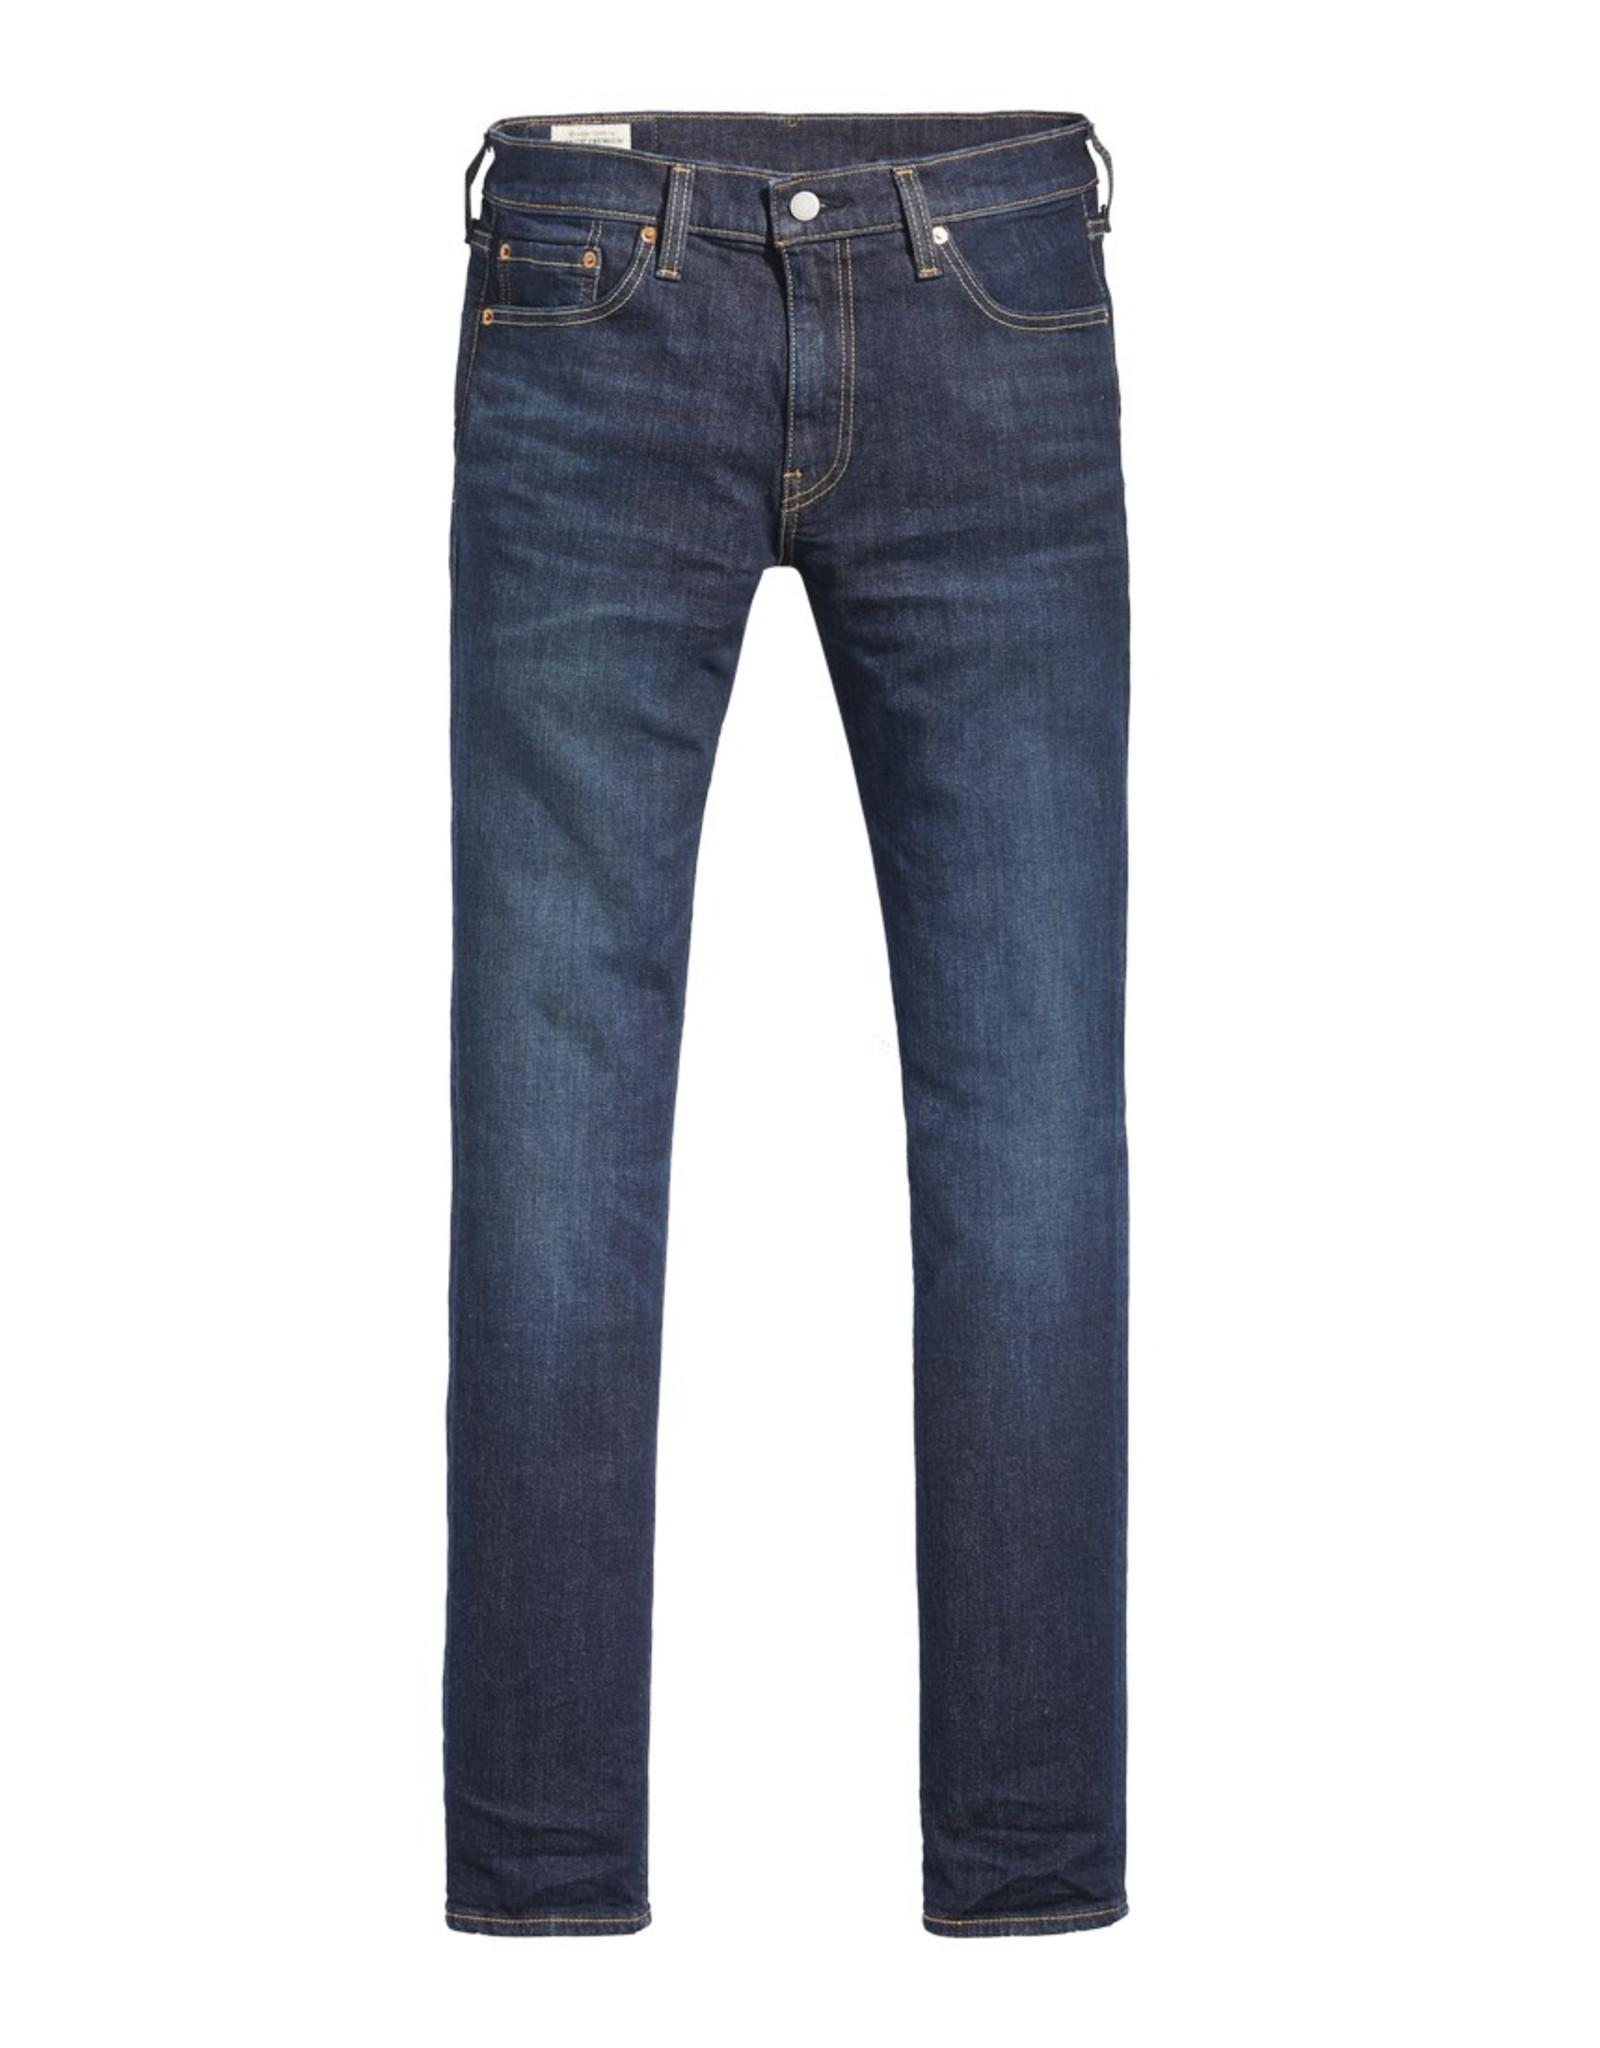 Levi's Levi's Jeans 511 Slim, Stretch